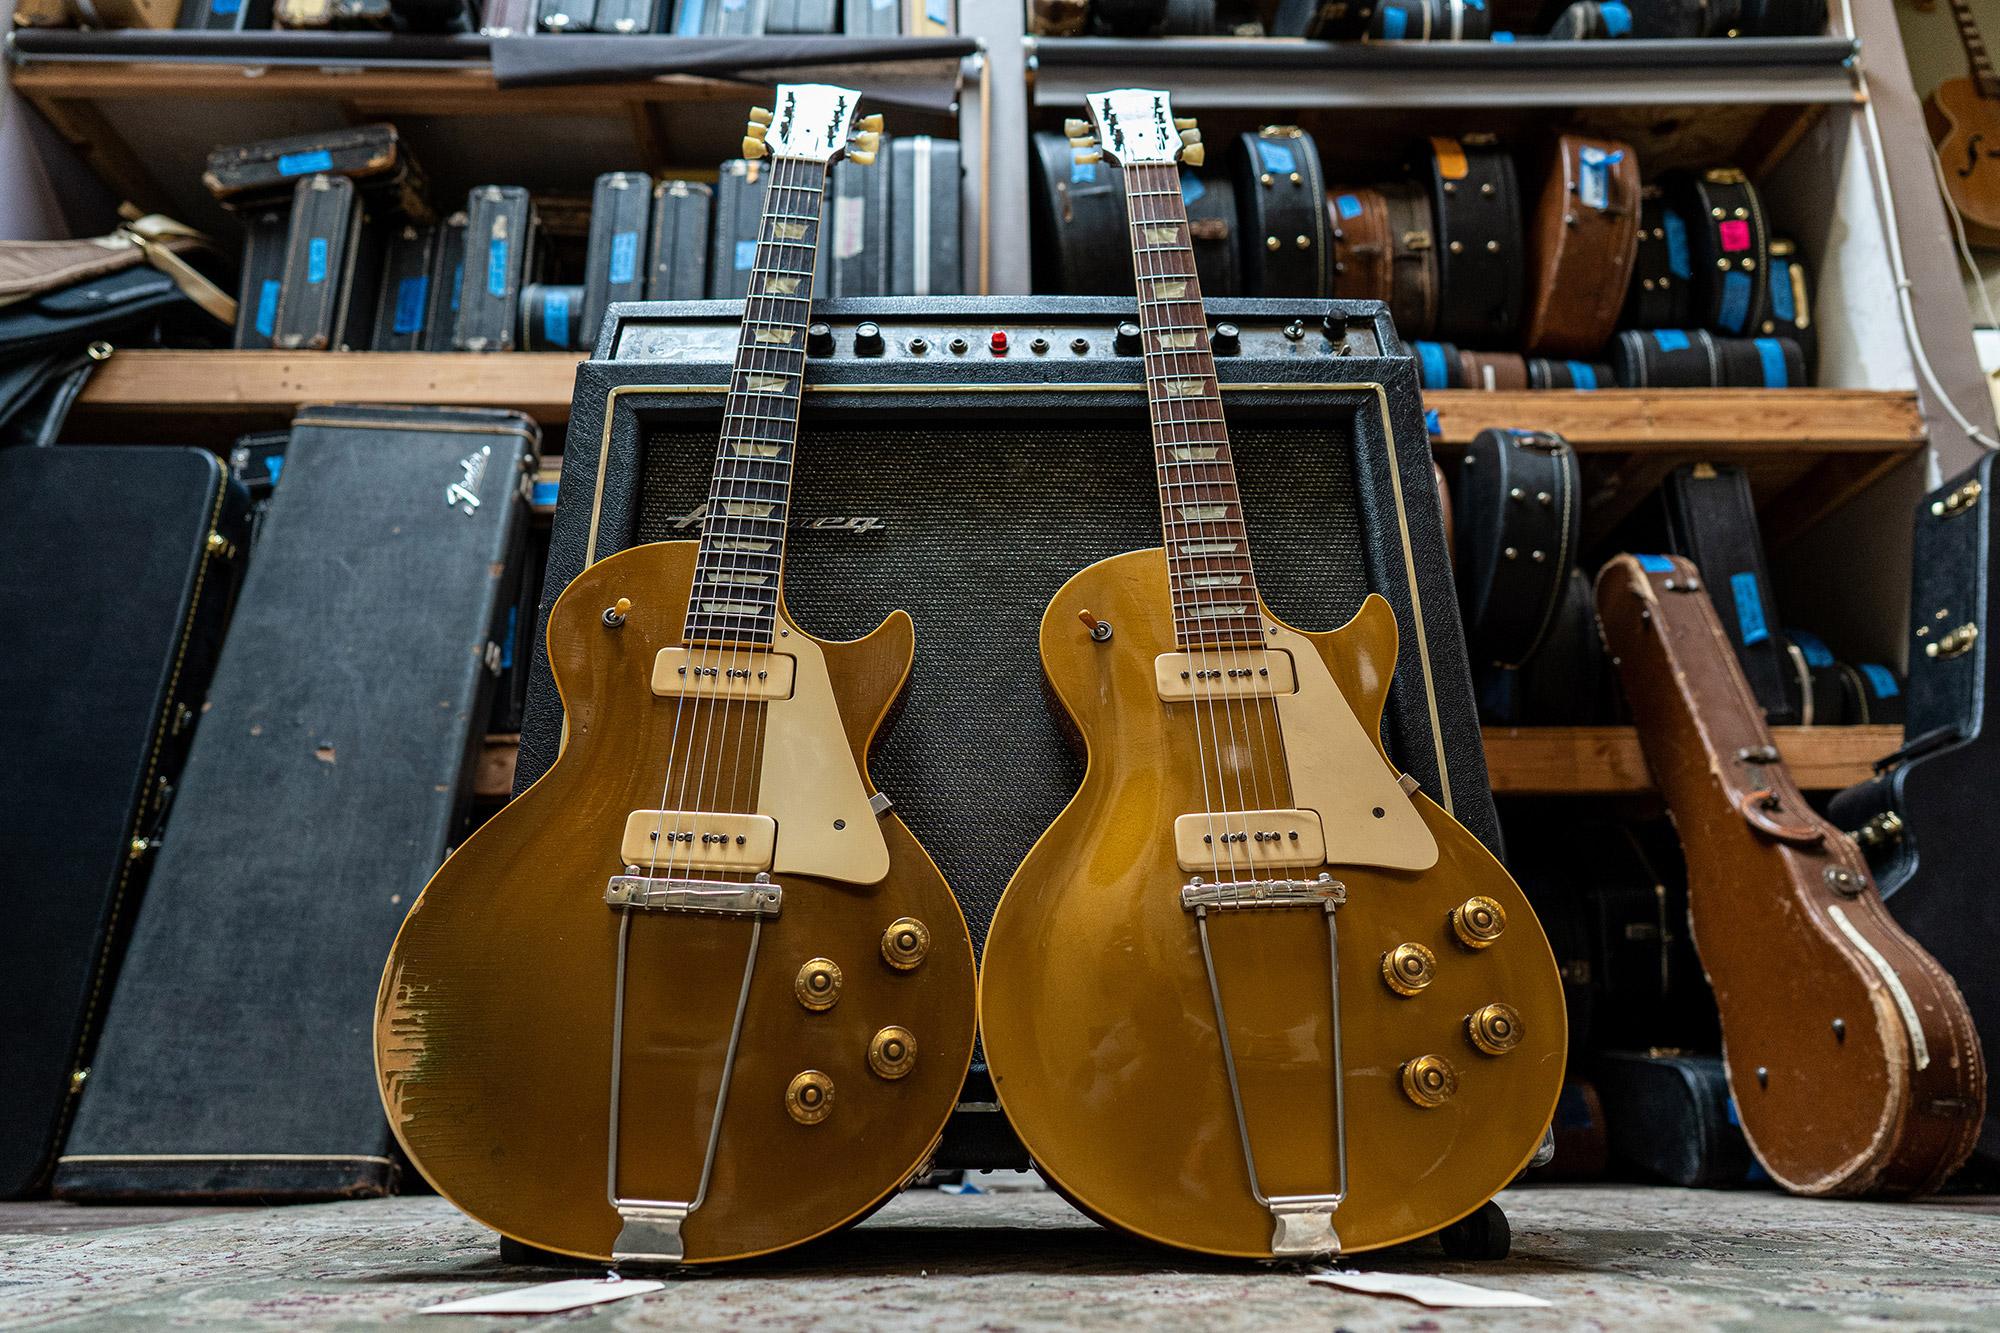 Imperial Vintage Guitars Gold Les Pauls